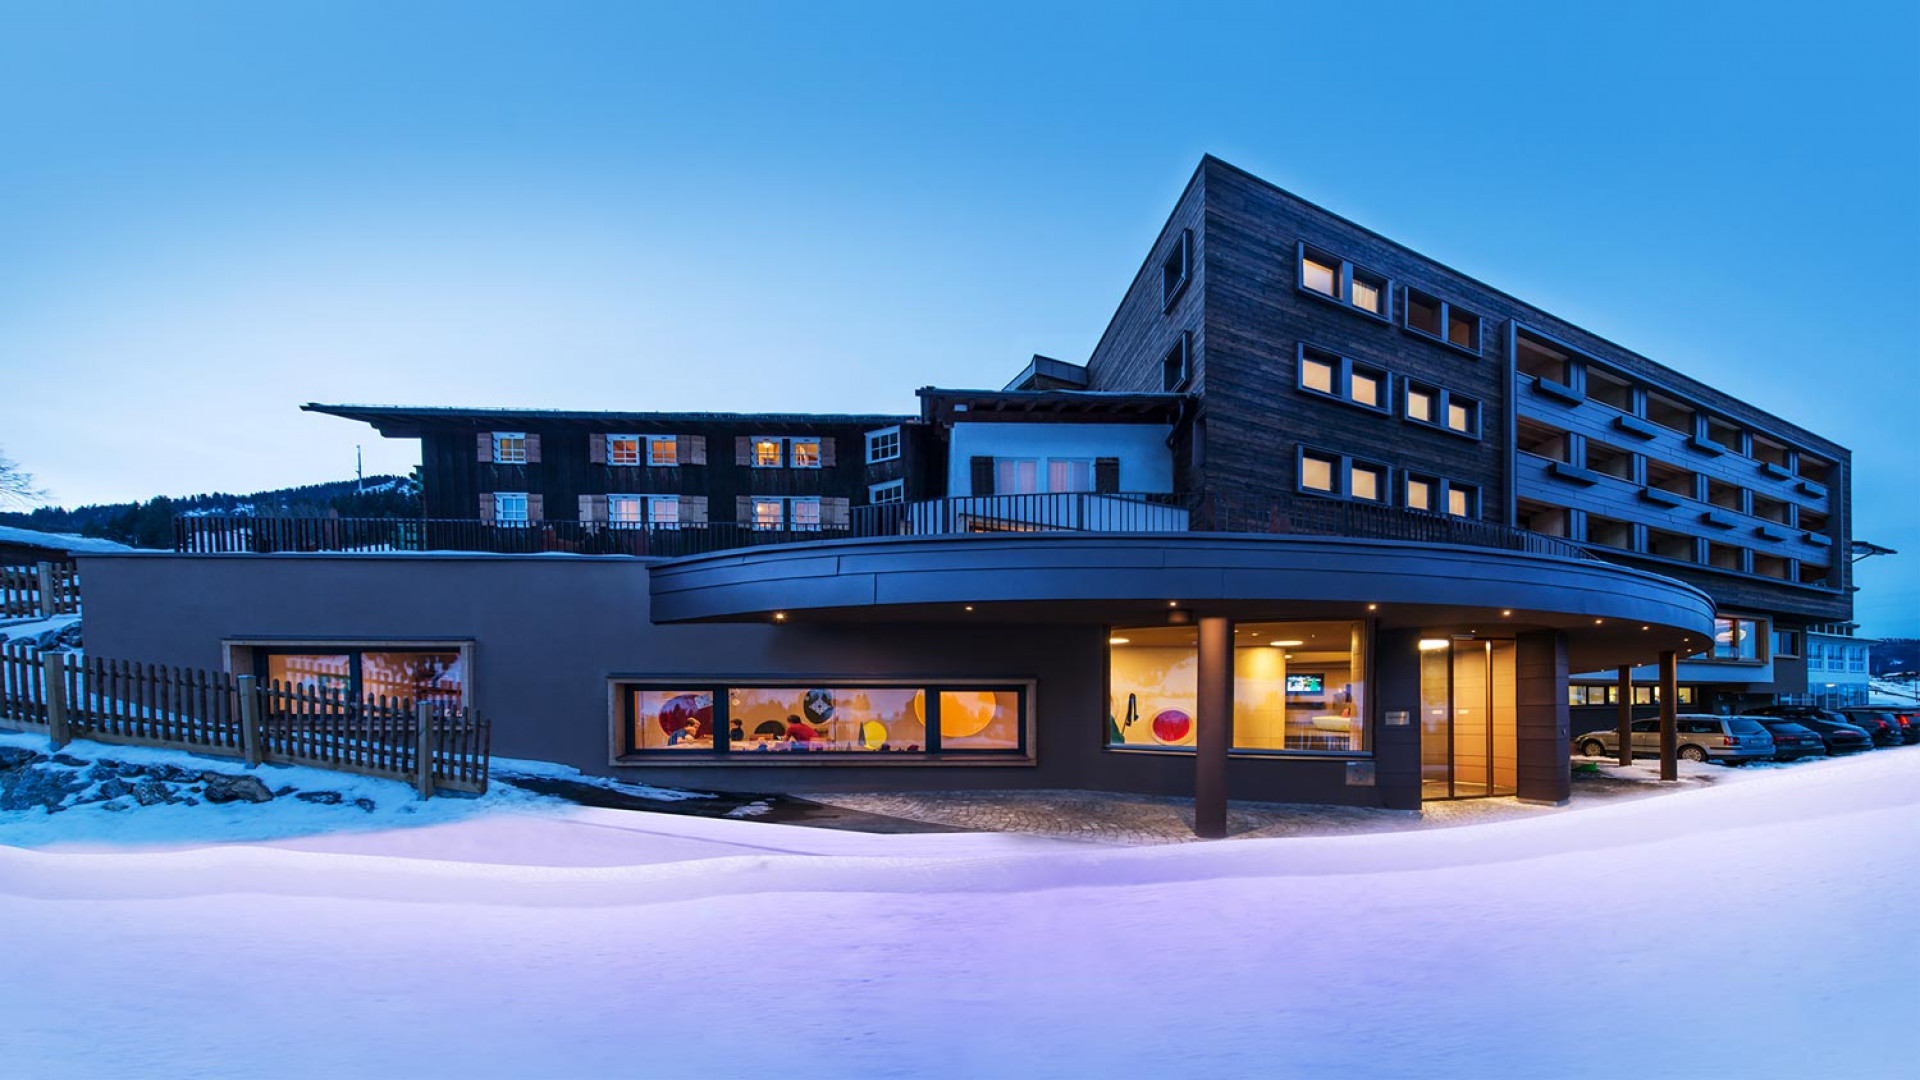 Alphotel, Austria